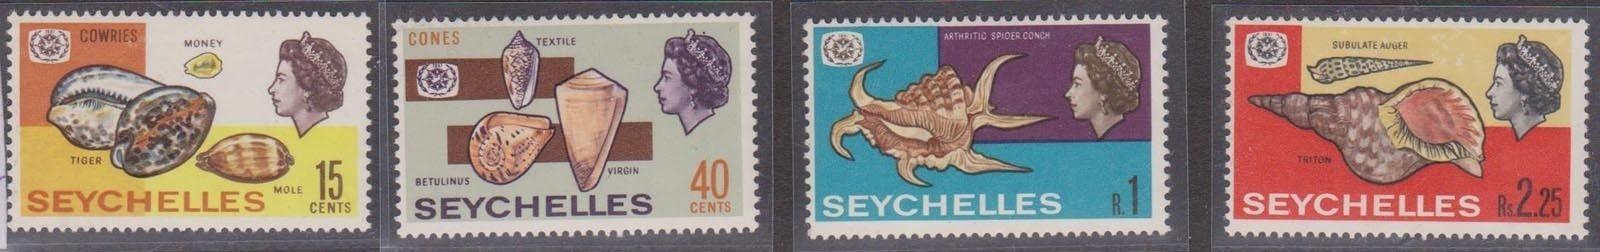 Seychelles shells 1967